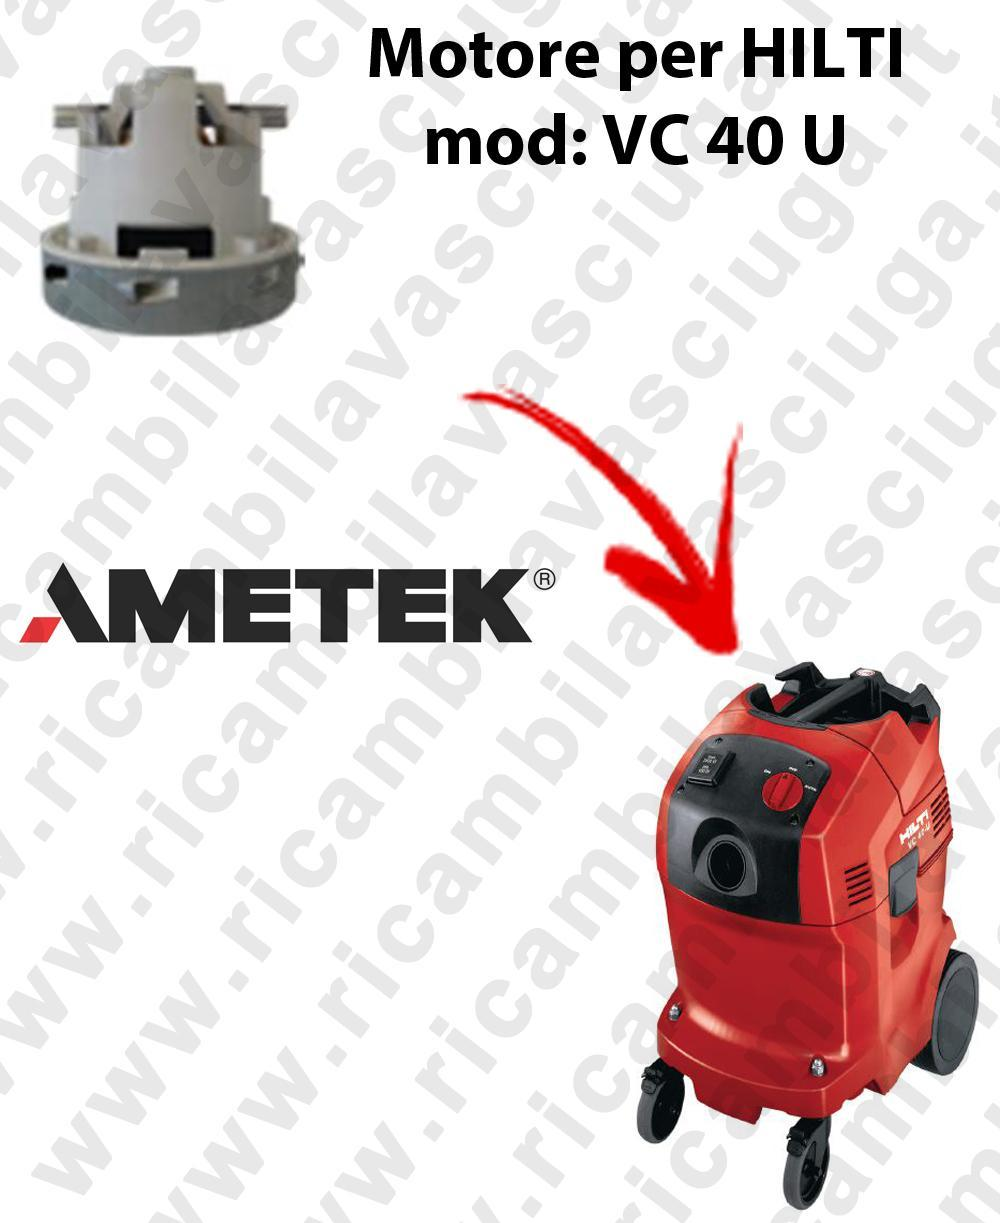 VC 40 U Automatic Saugmotor AMETEK für Staubsauger HILTI